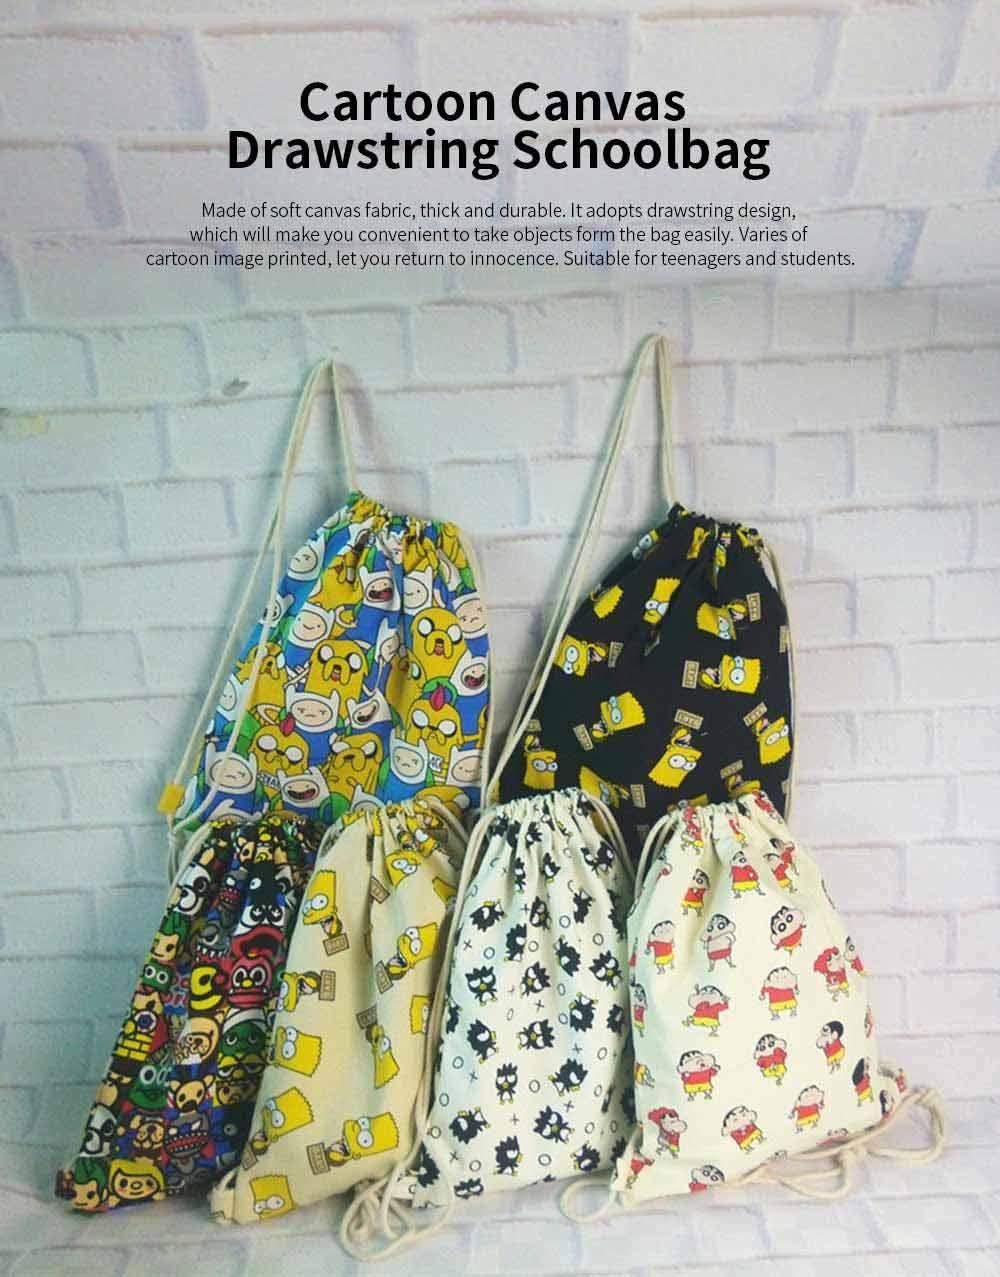 Cartoon Canvas Drawstring Schoolbag, Cactus Pattern Canvas Bundle Pocket for Students 0